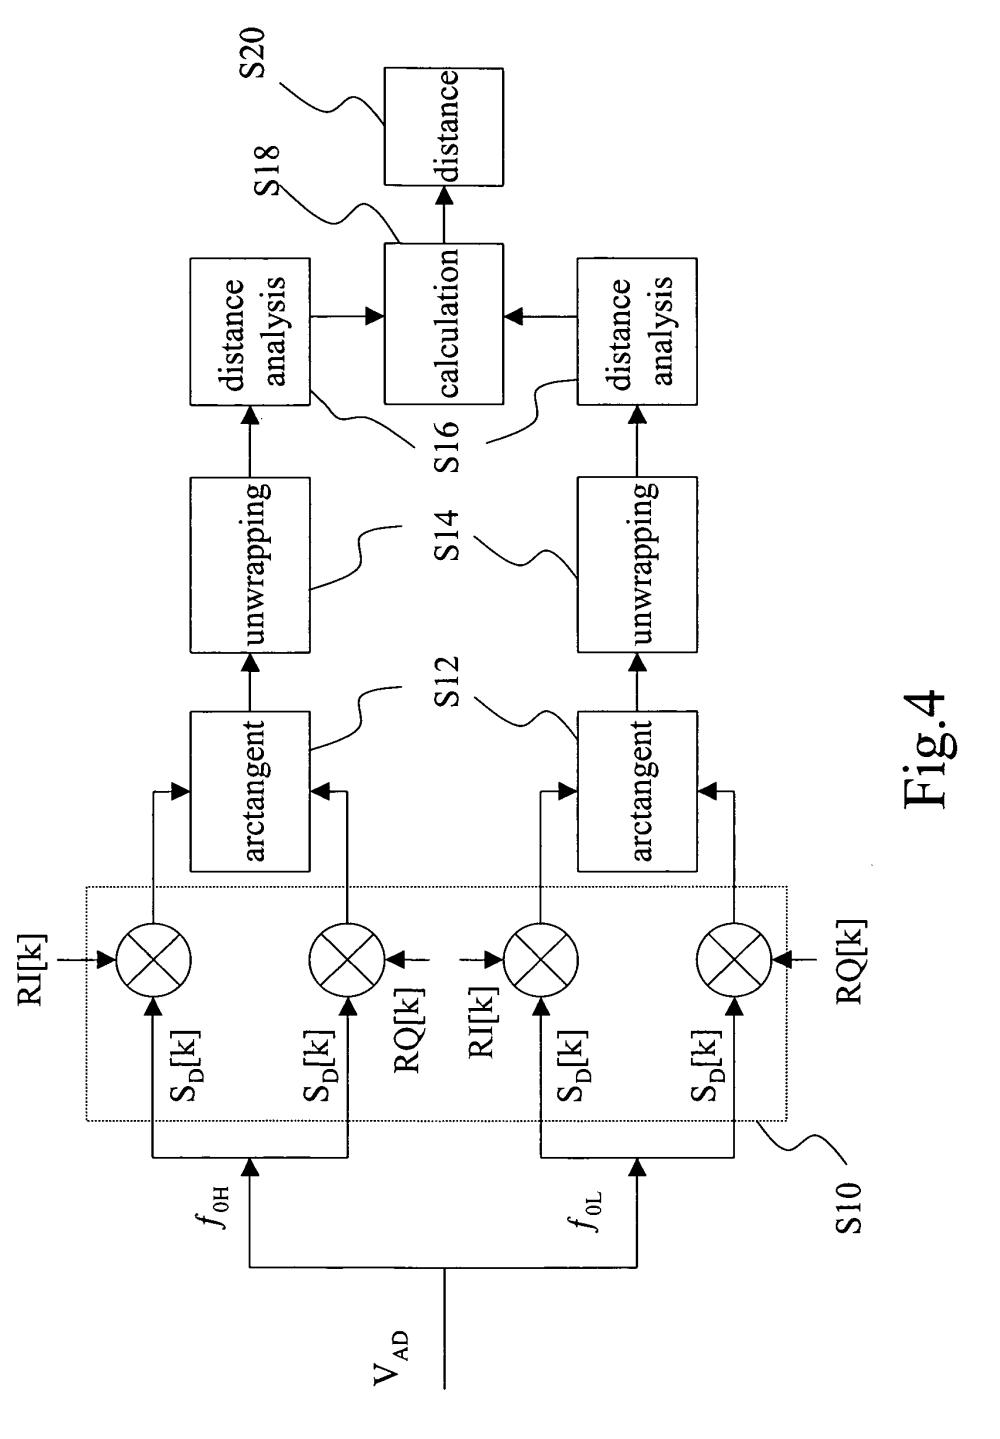 medium resolution of tripac apu alternator wiring diagram 36 wiring diagram imagesus20070127009a1 20070607 d00004 thermo king alternator wiring diagram